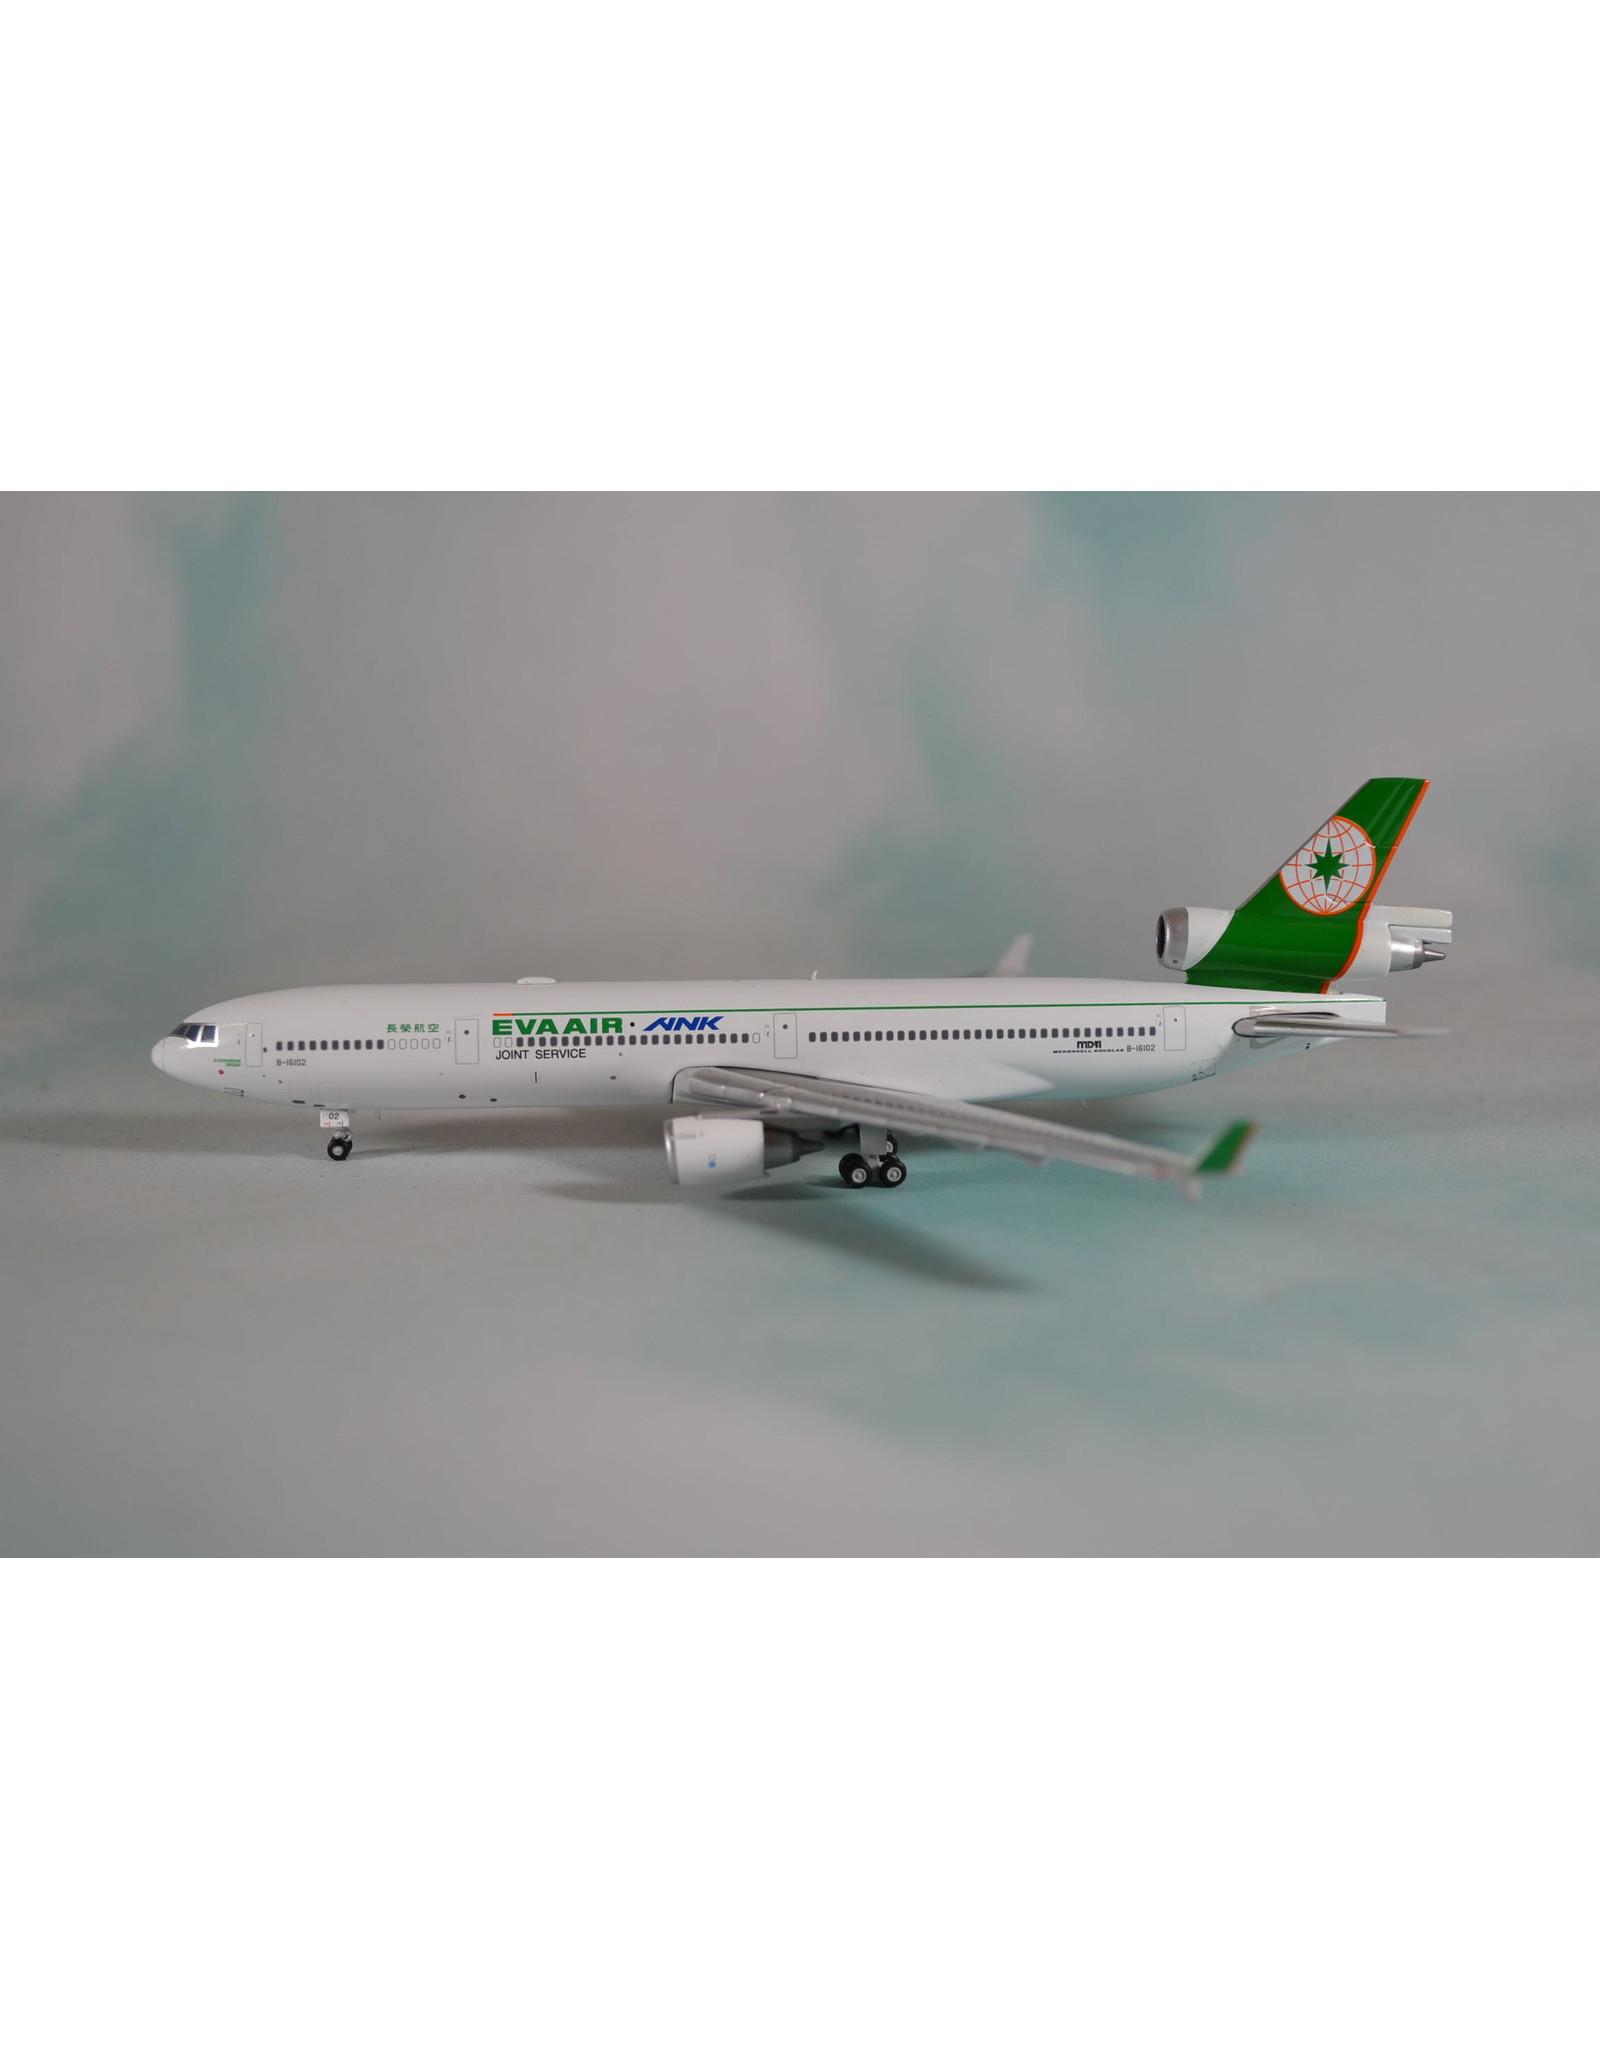 JC Wings JC4 EVA MD-11 B-16102